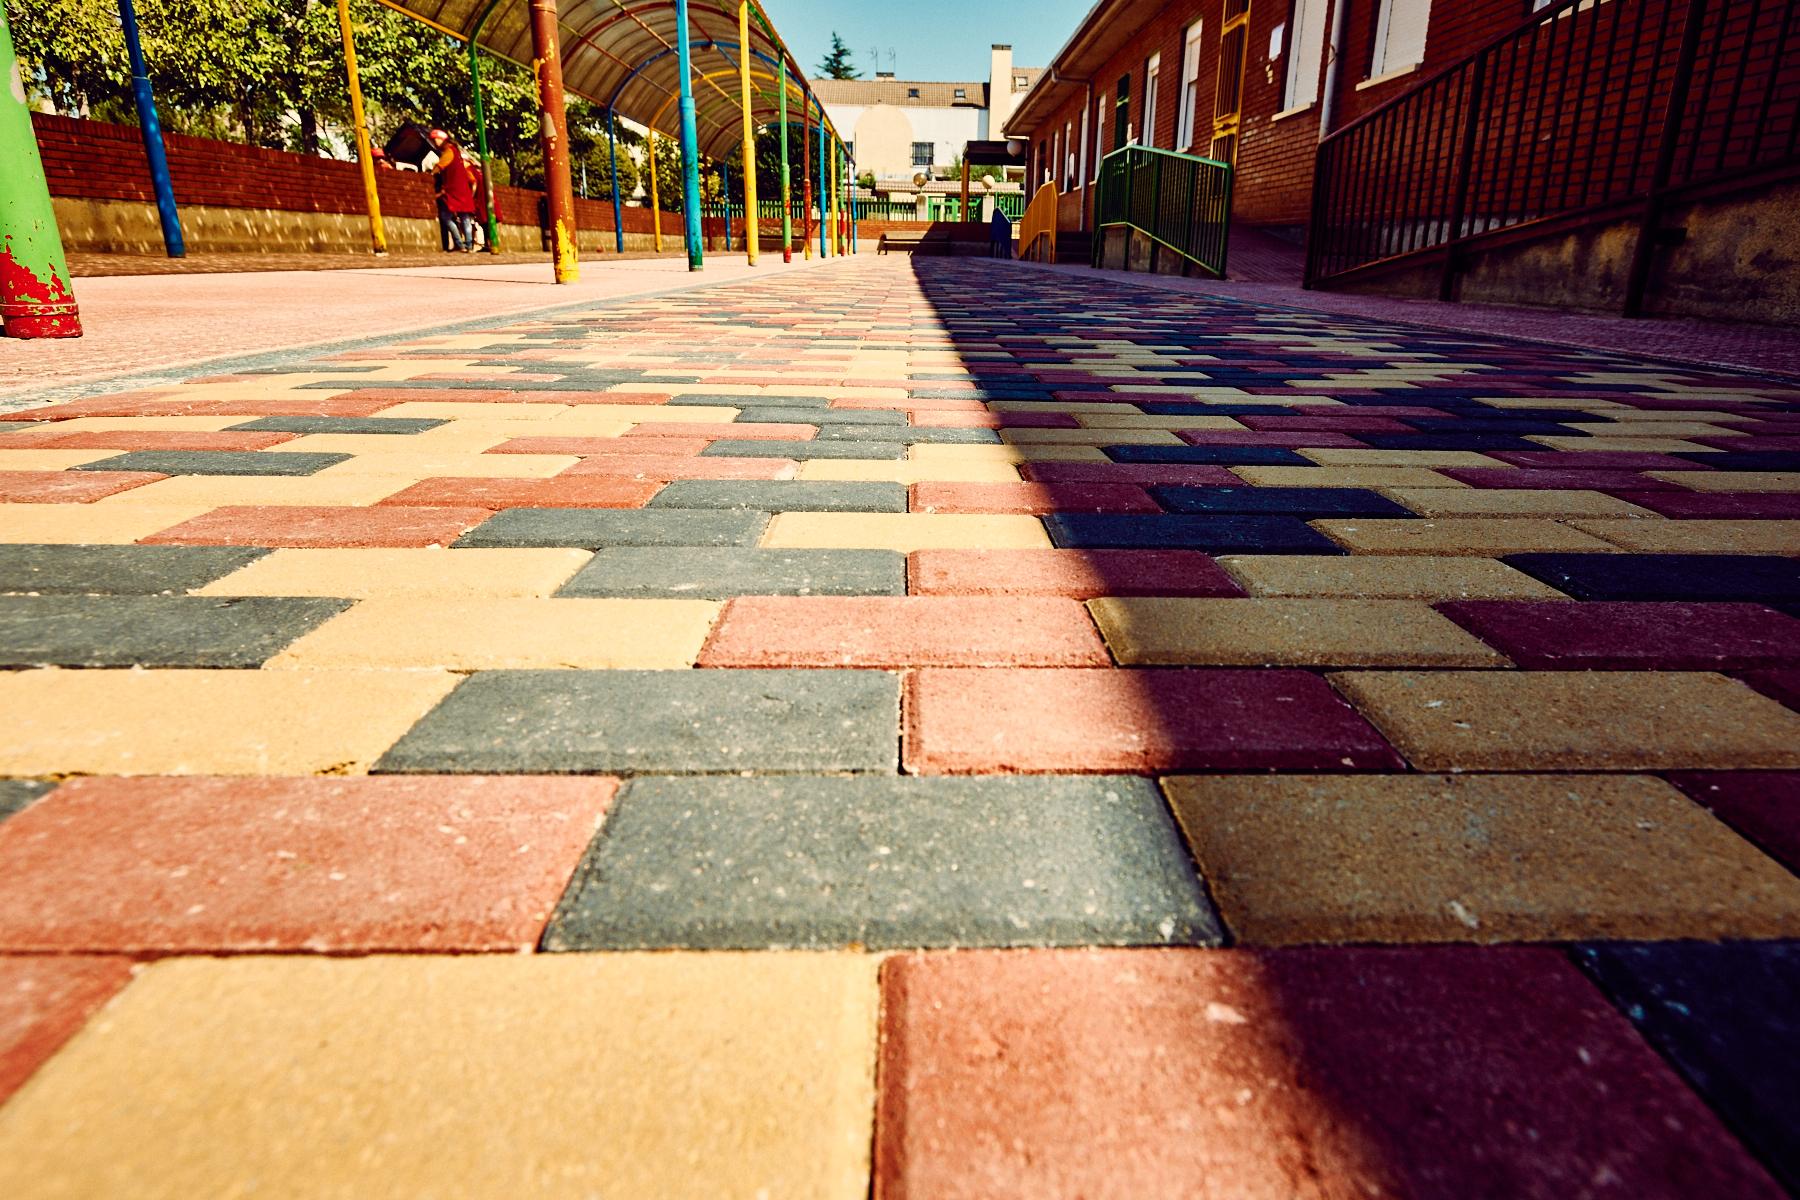 Fotoperiodismo - Centros educativos